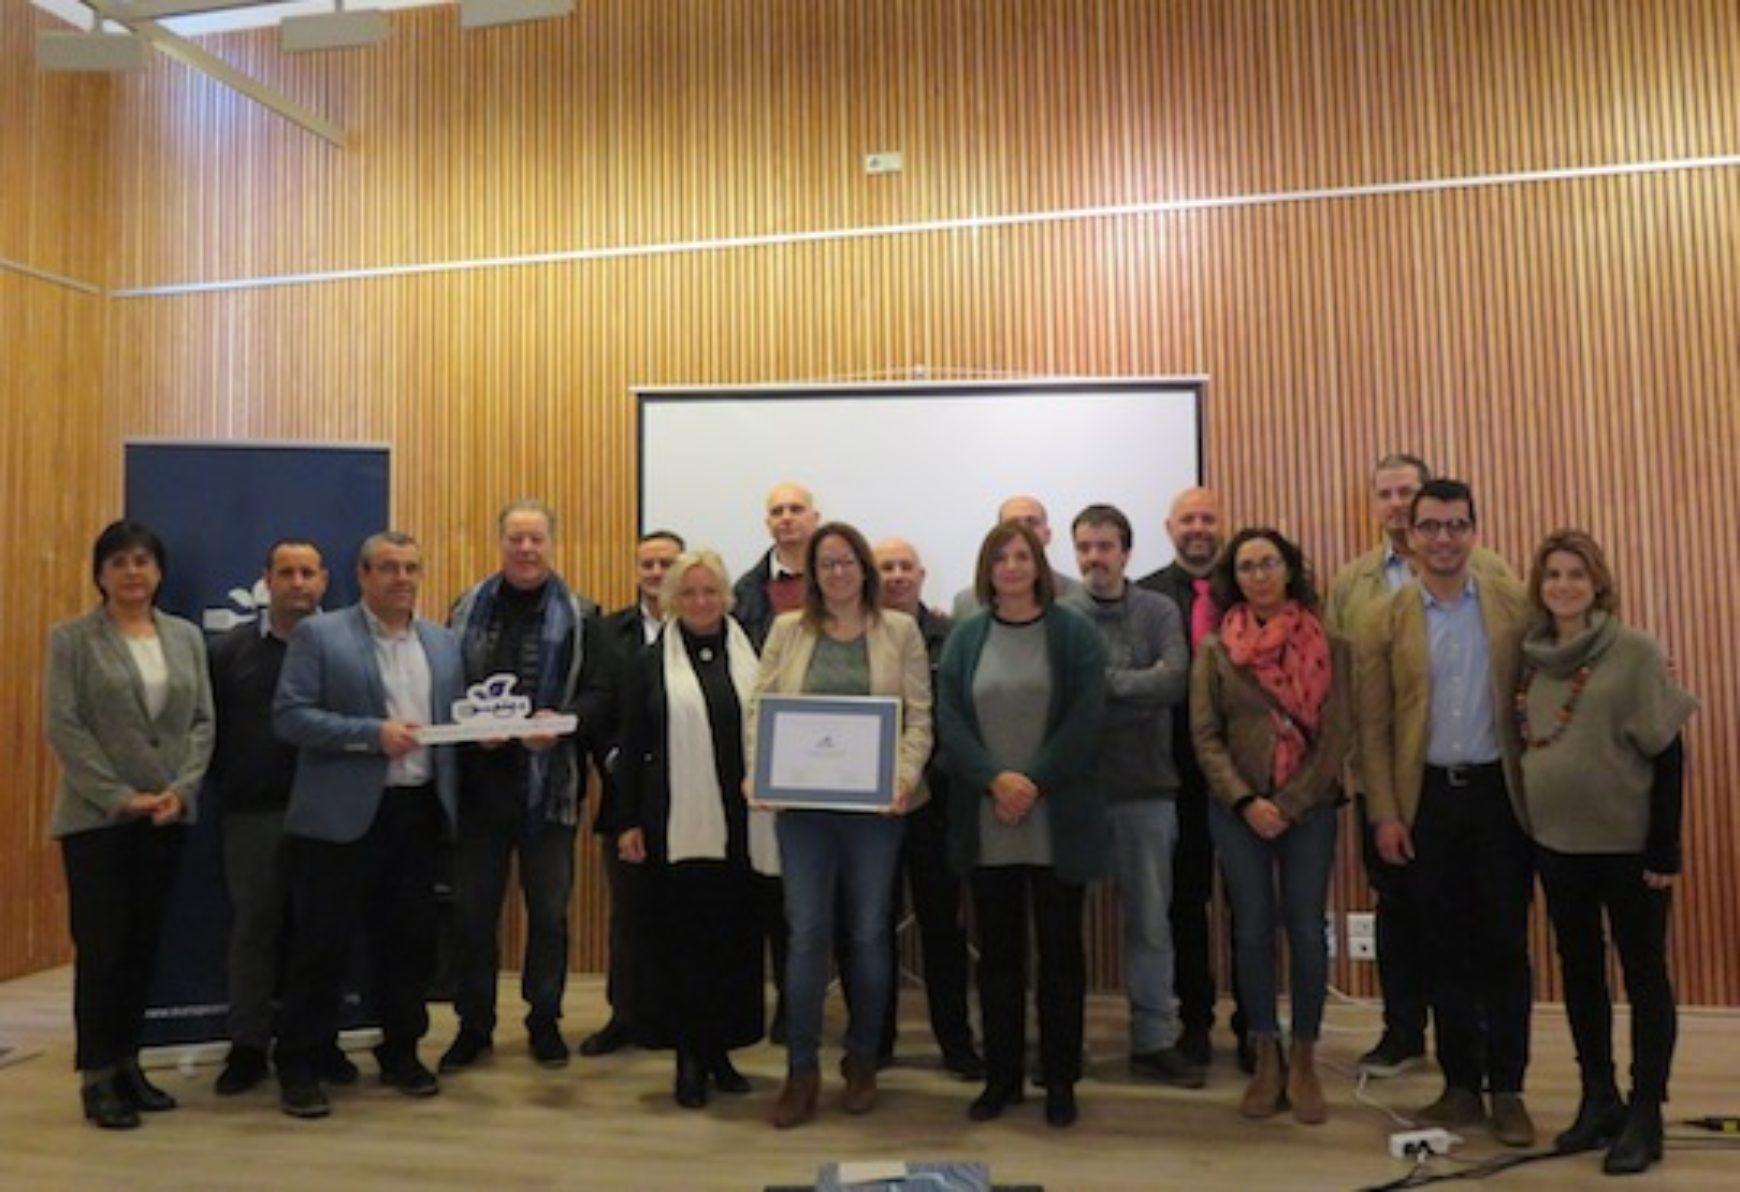 Menorca awarded European Region of Gastronomy 2022